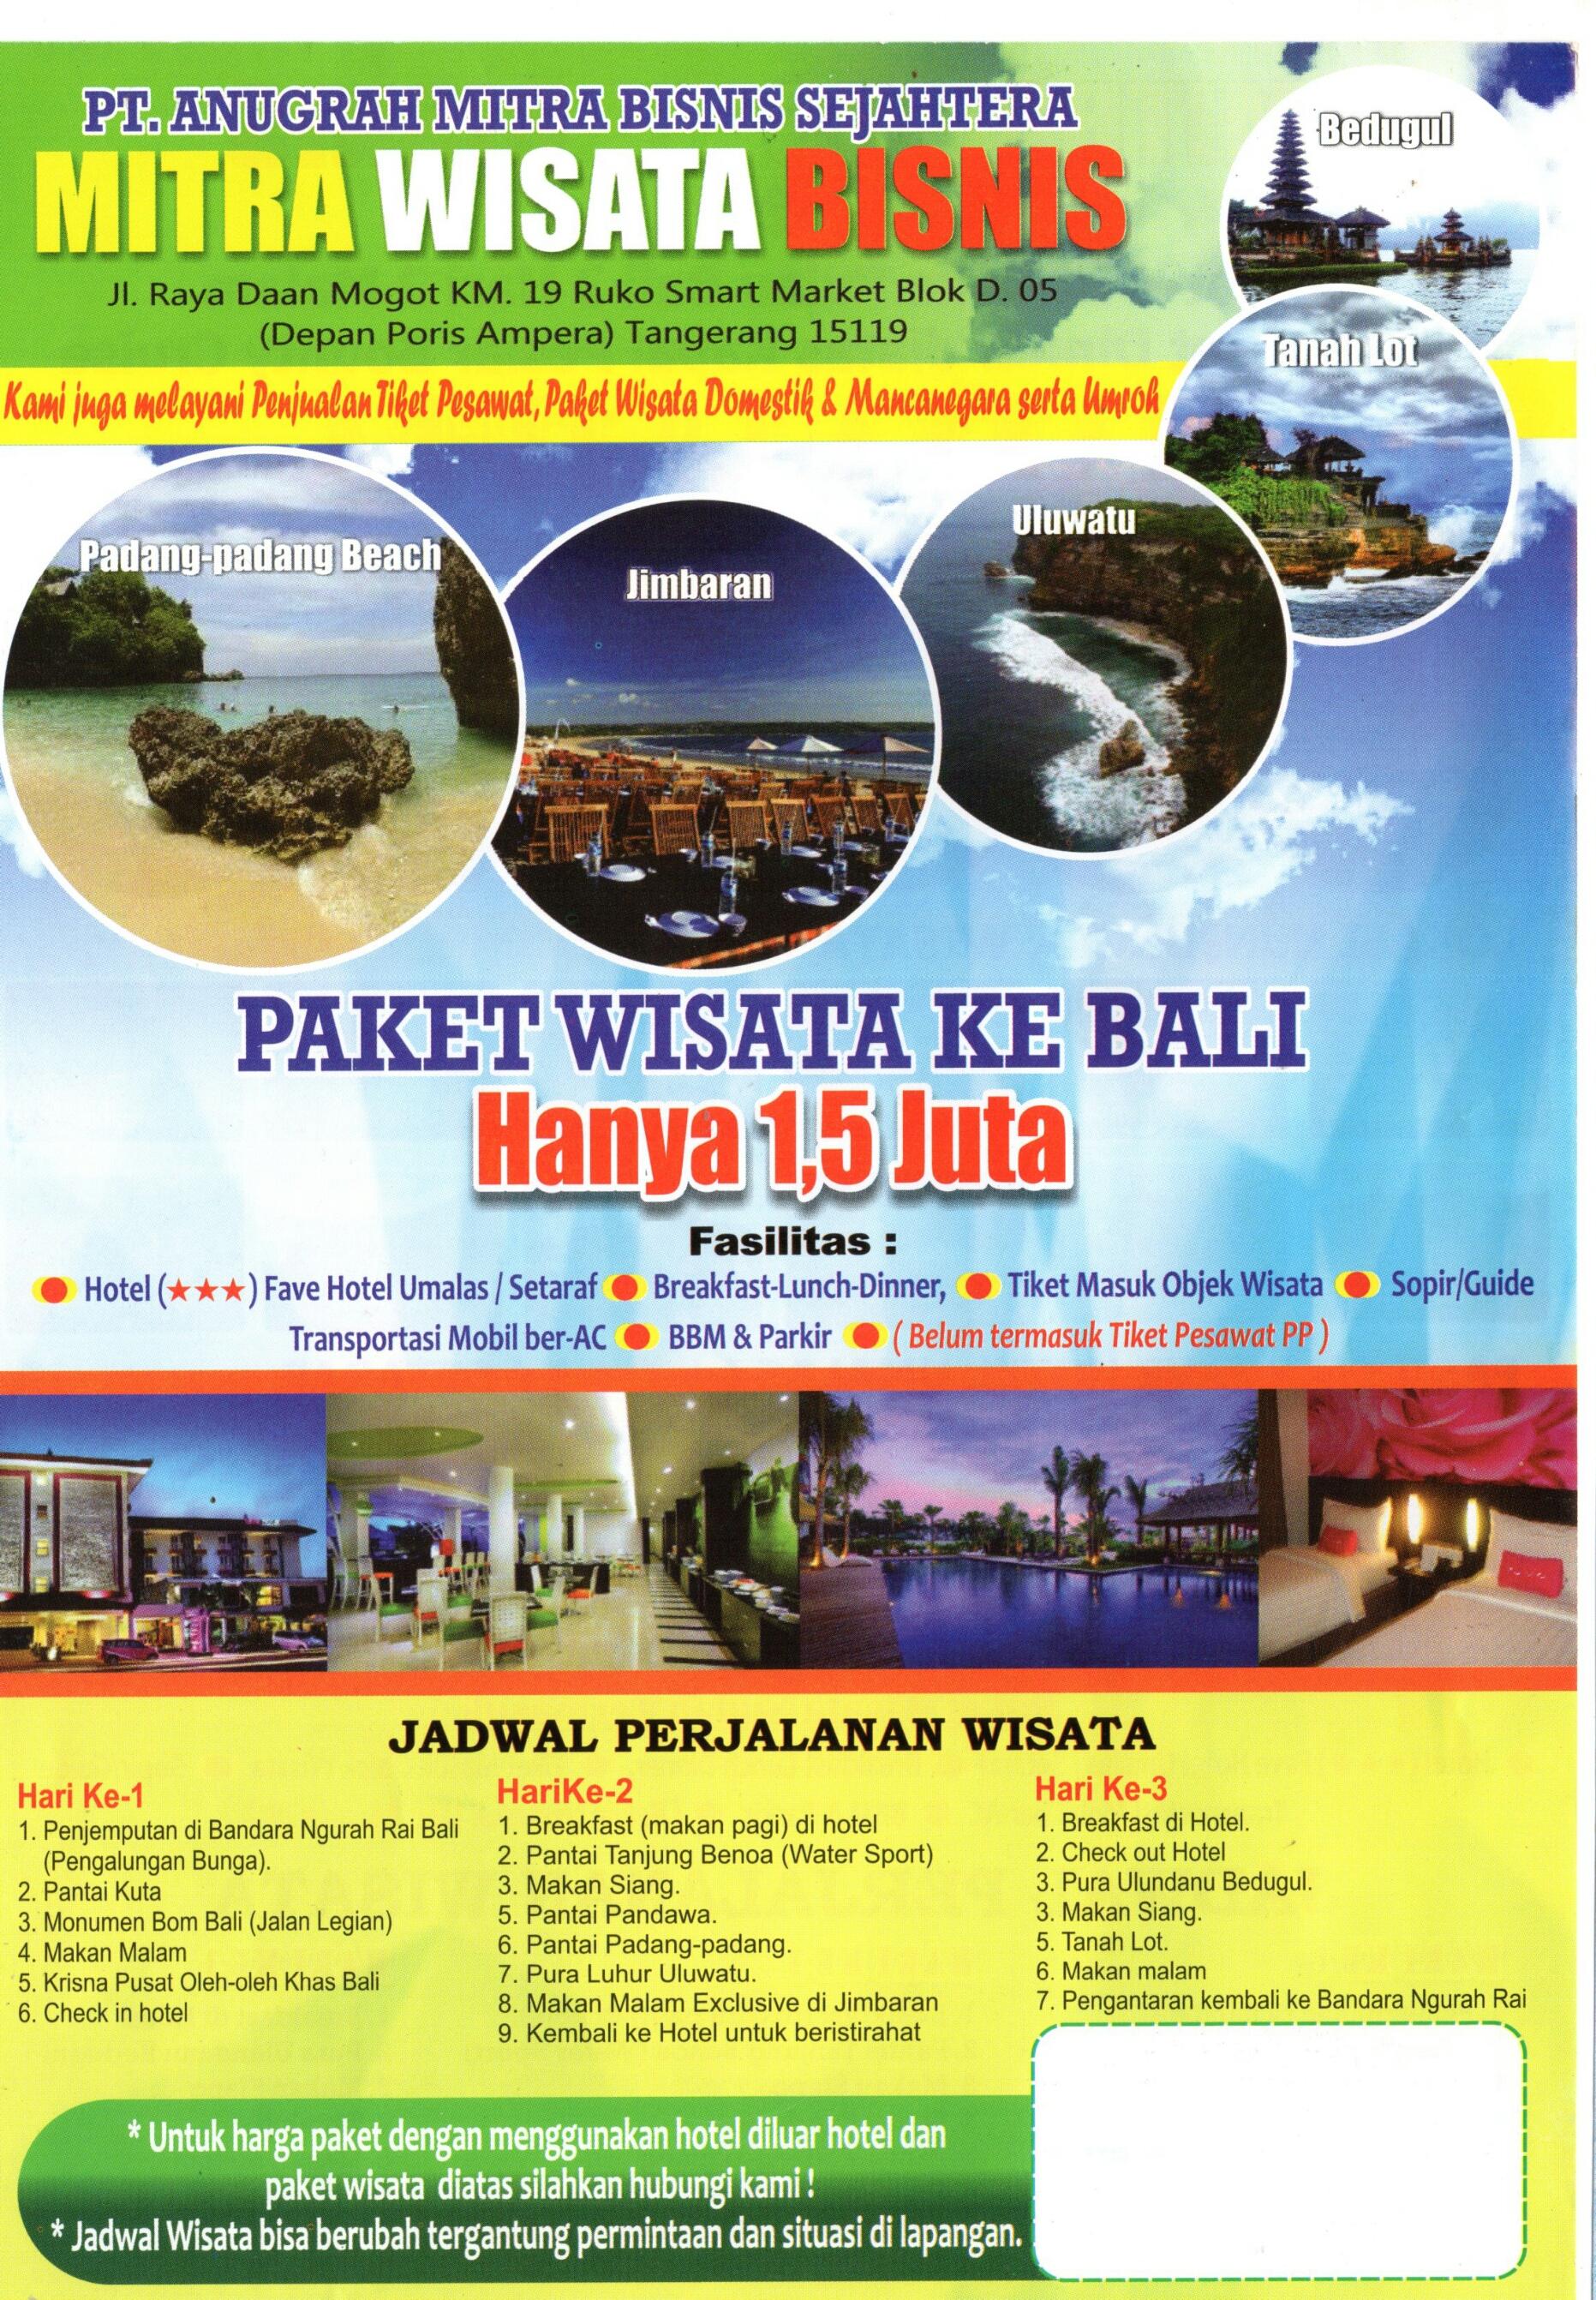 Jual Paket Wisata Bali 3 Hari 2 Malam 15 Juta Mitra Bisnis Tour 4 Tokopedia